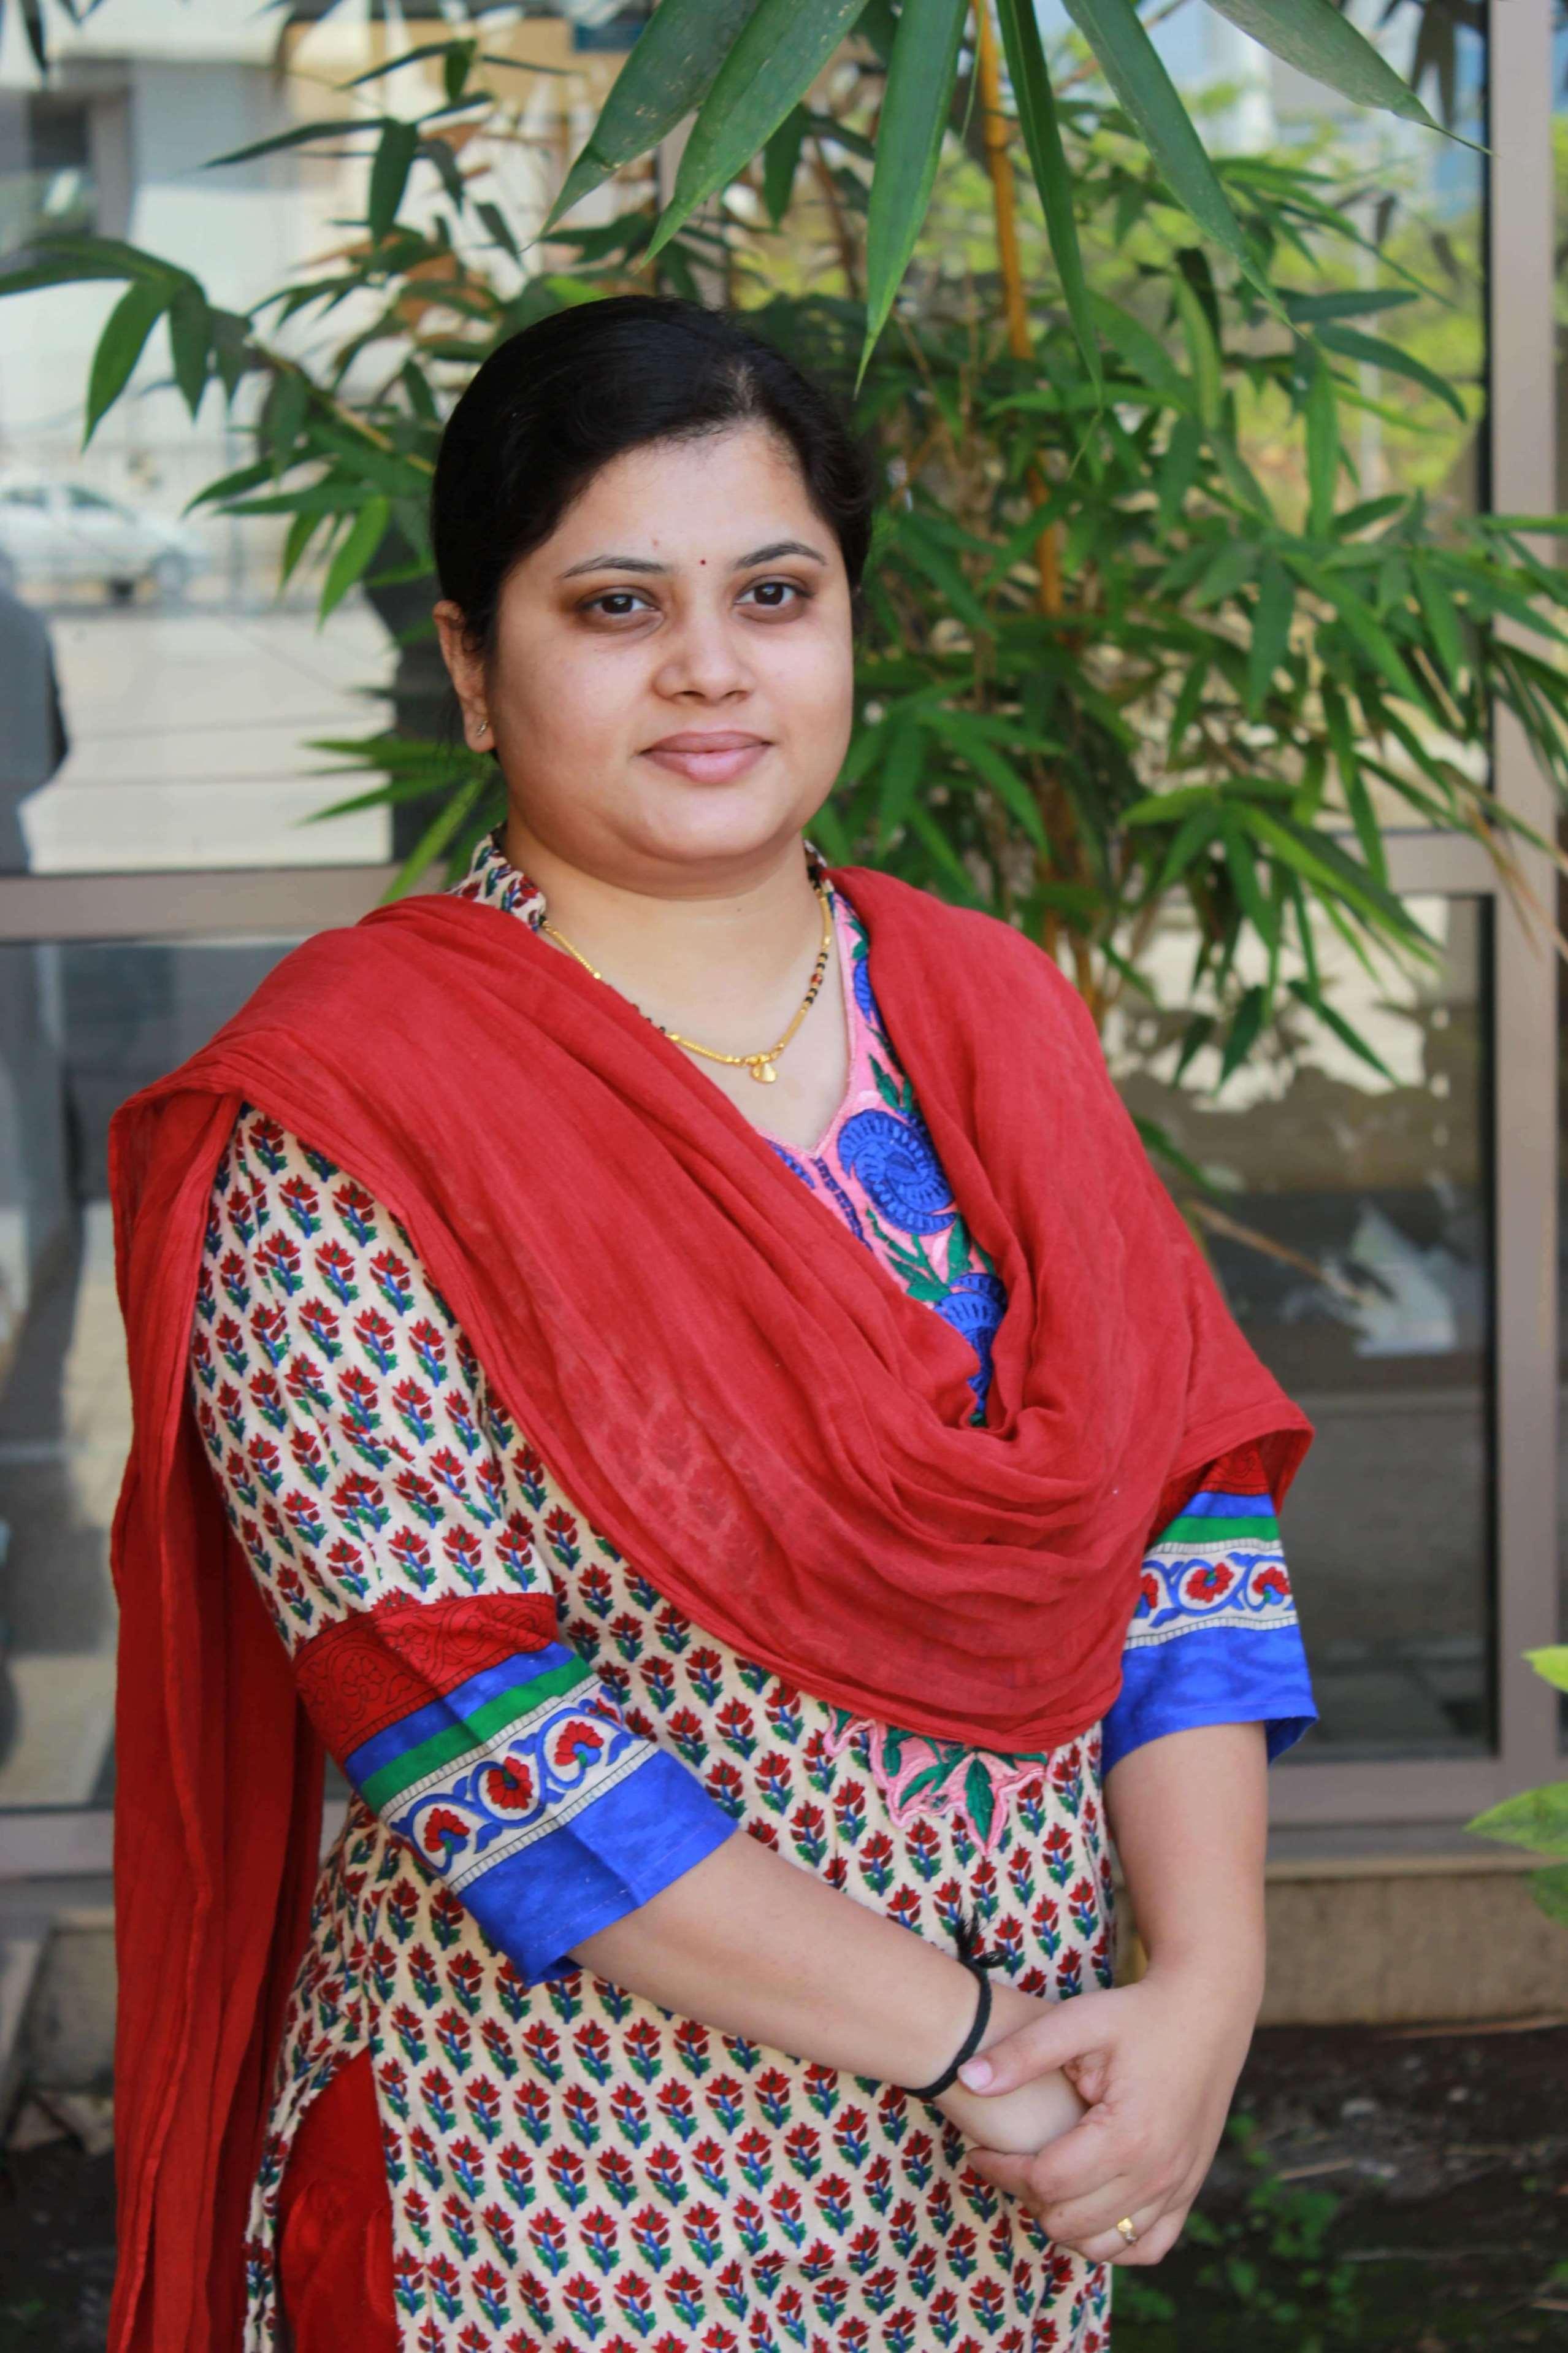 Mrs. Patvardhan Neha